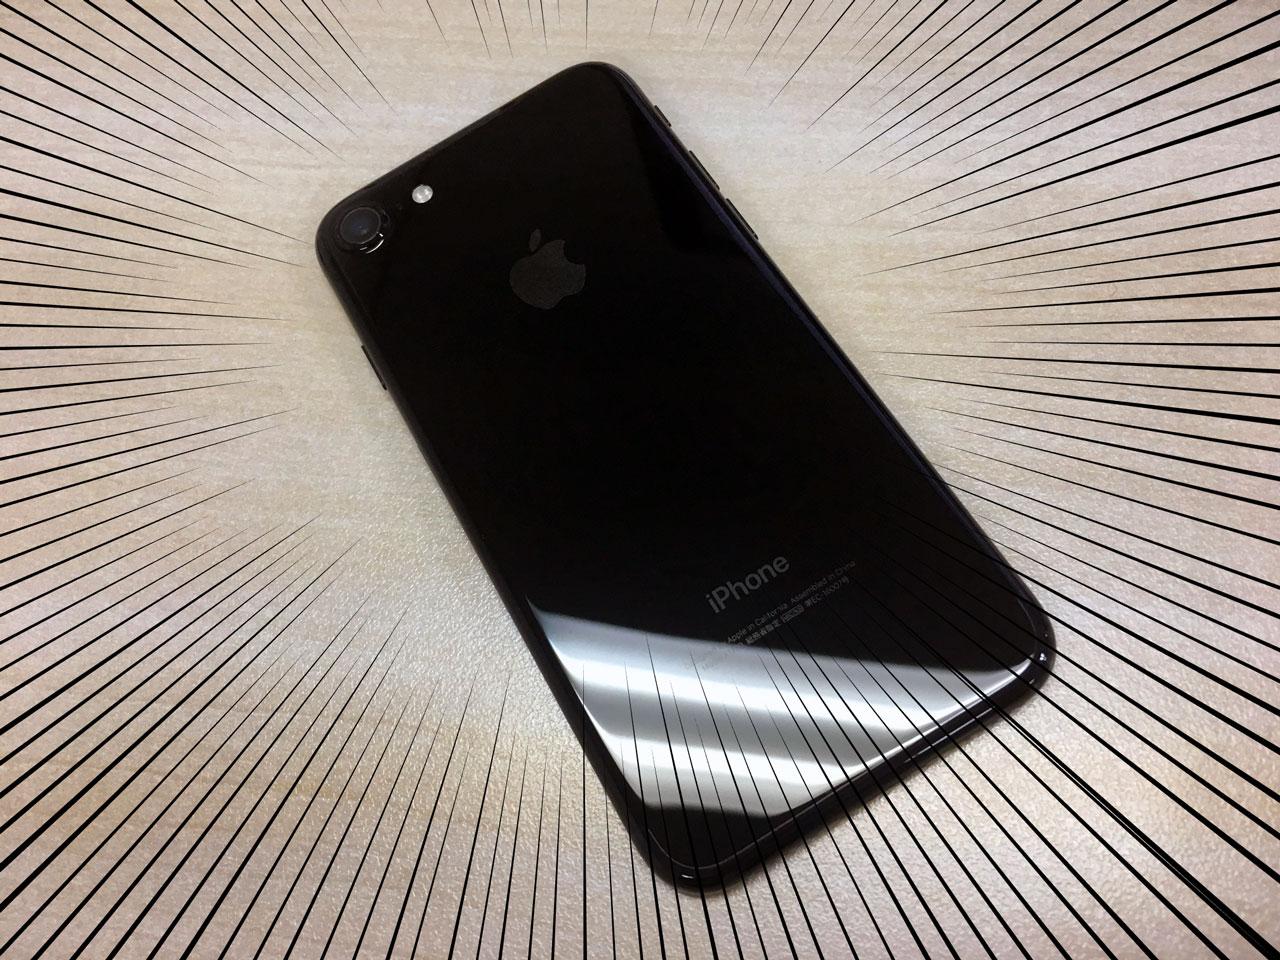 iphone7. jpg